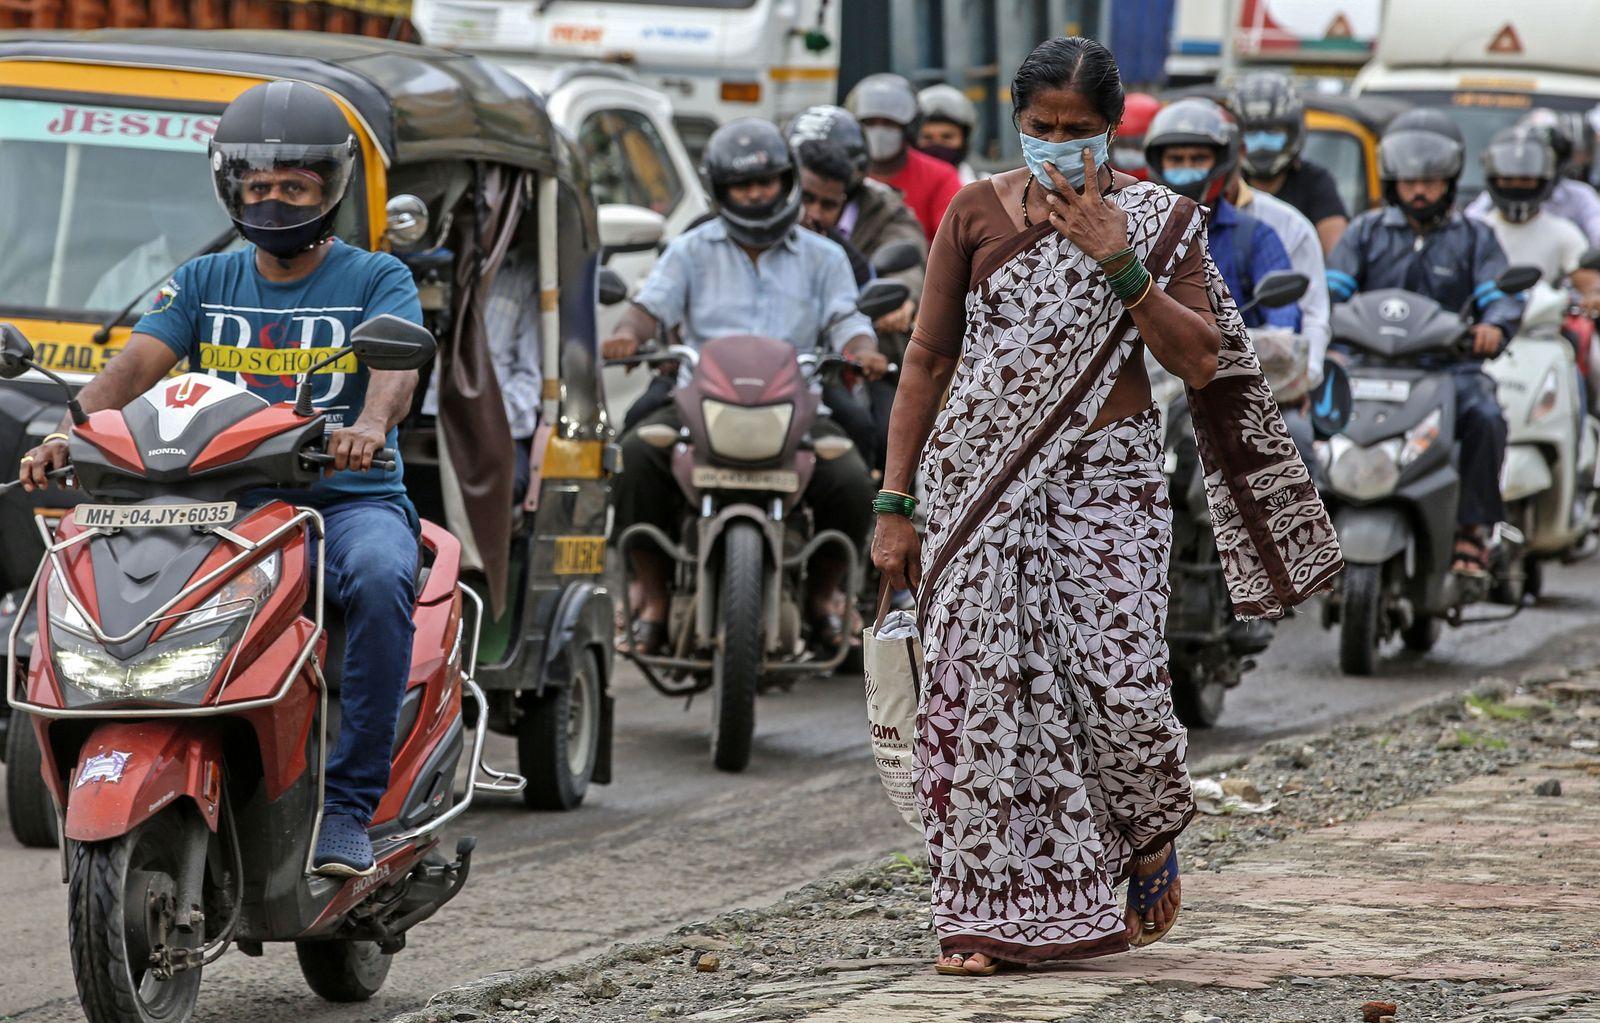 Indian crossed three million coronavirus cases so far, Mumbai, India - 31 Aug 2020